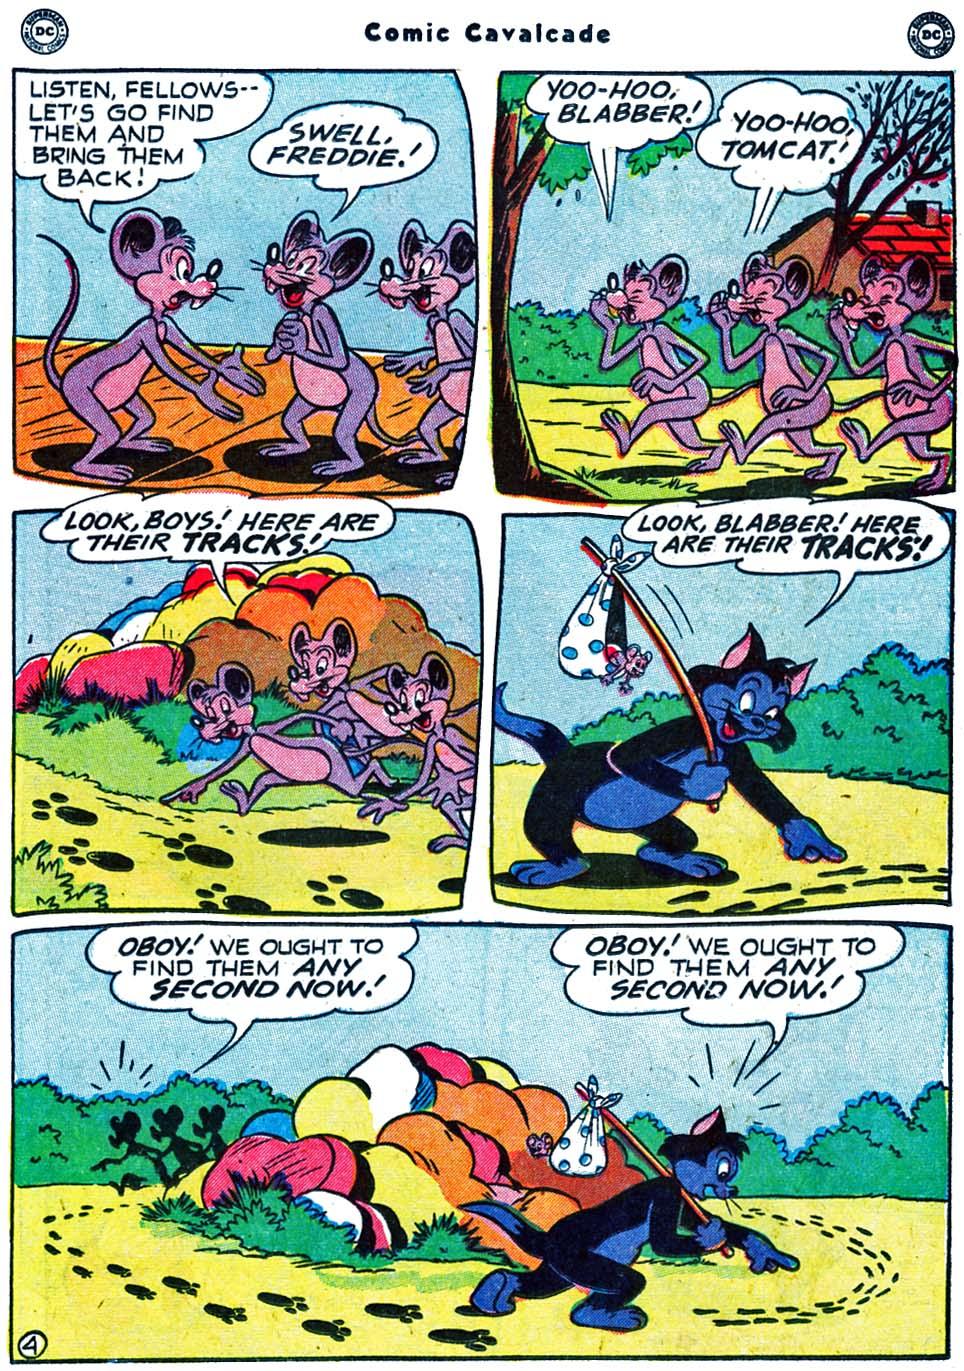 Comic Cavalcade issue 39 - Page 23